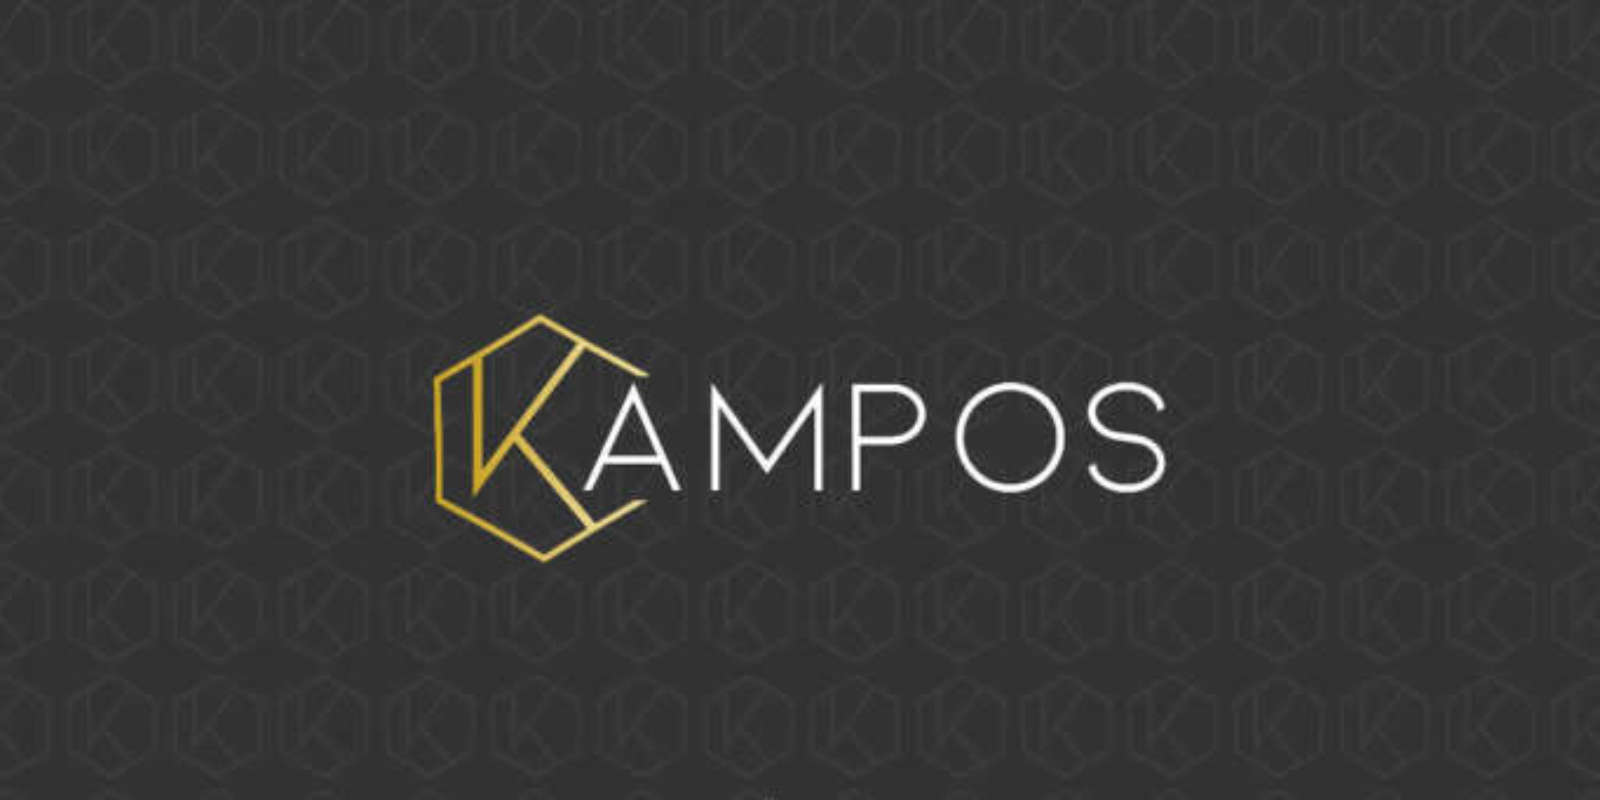 Kampos-identity_header